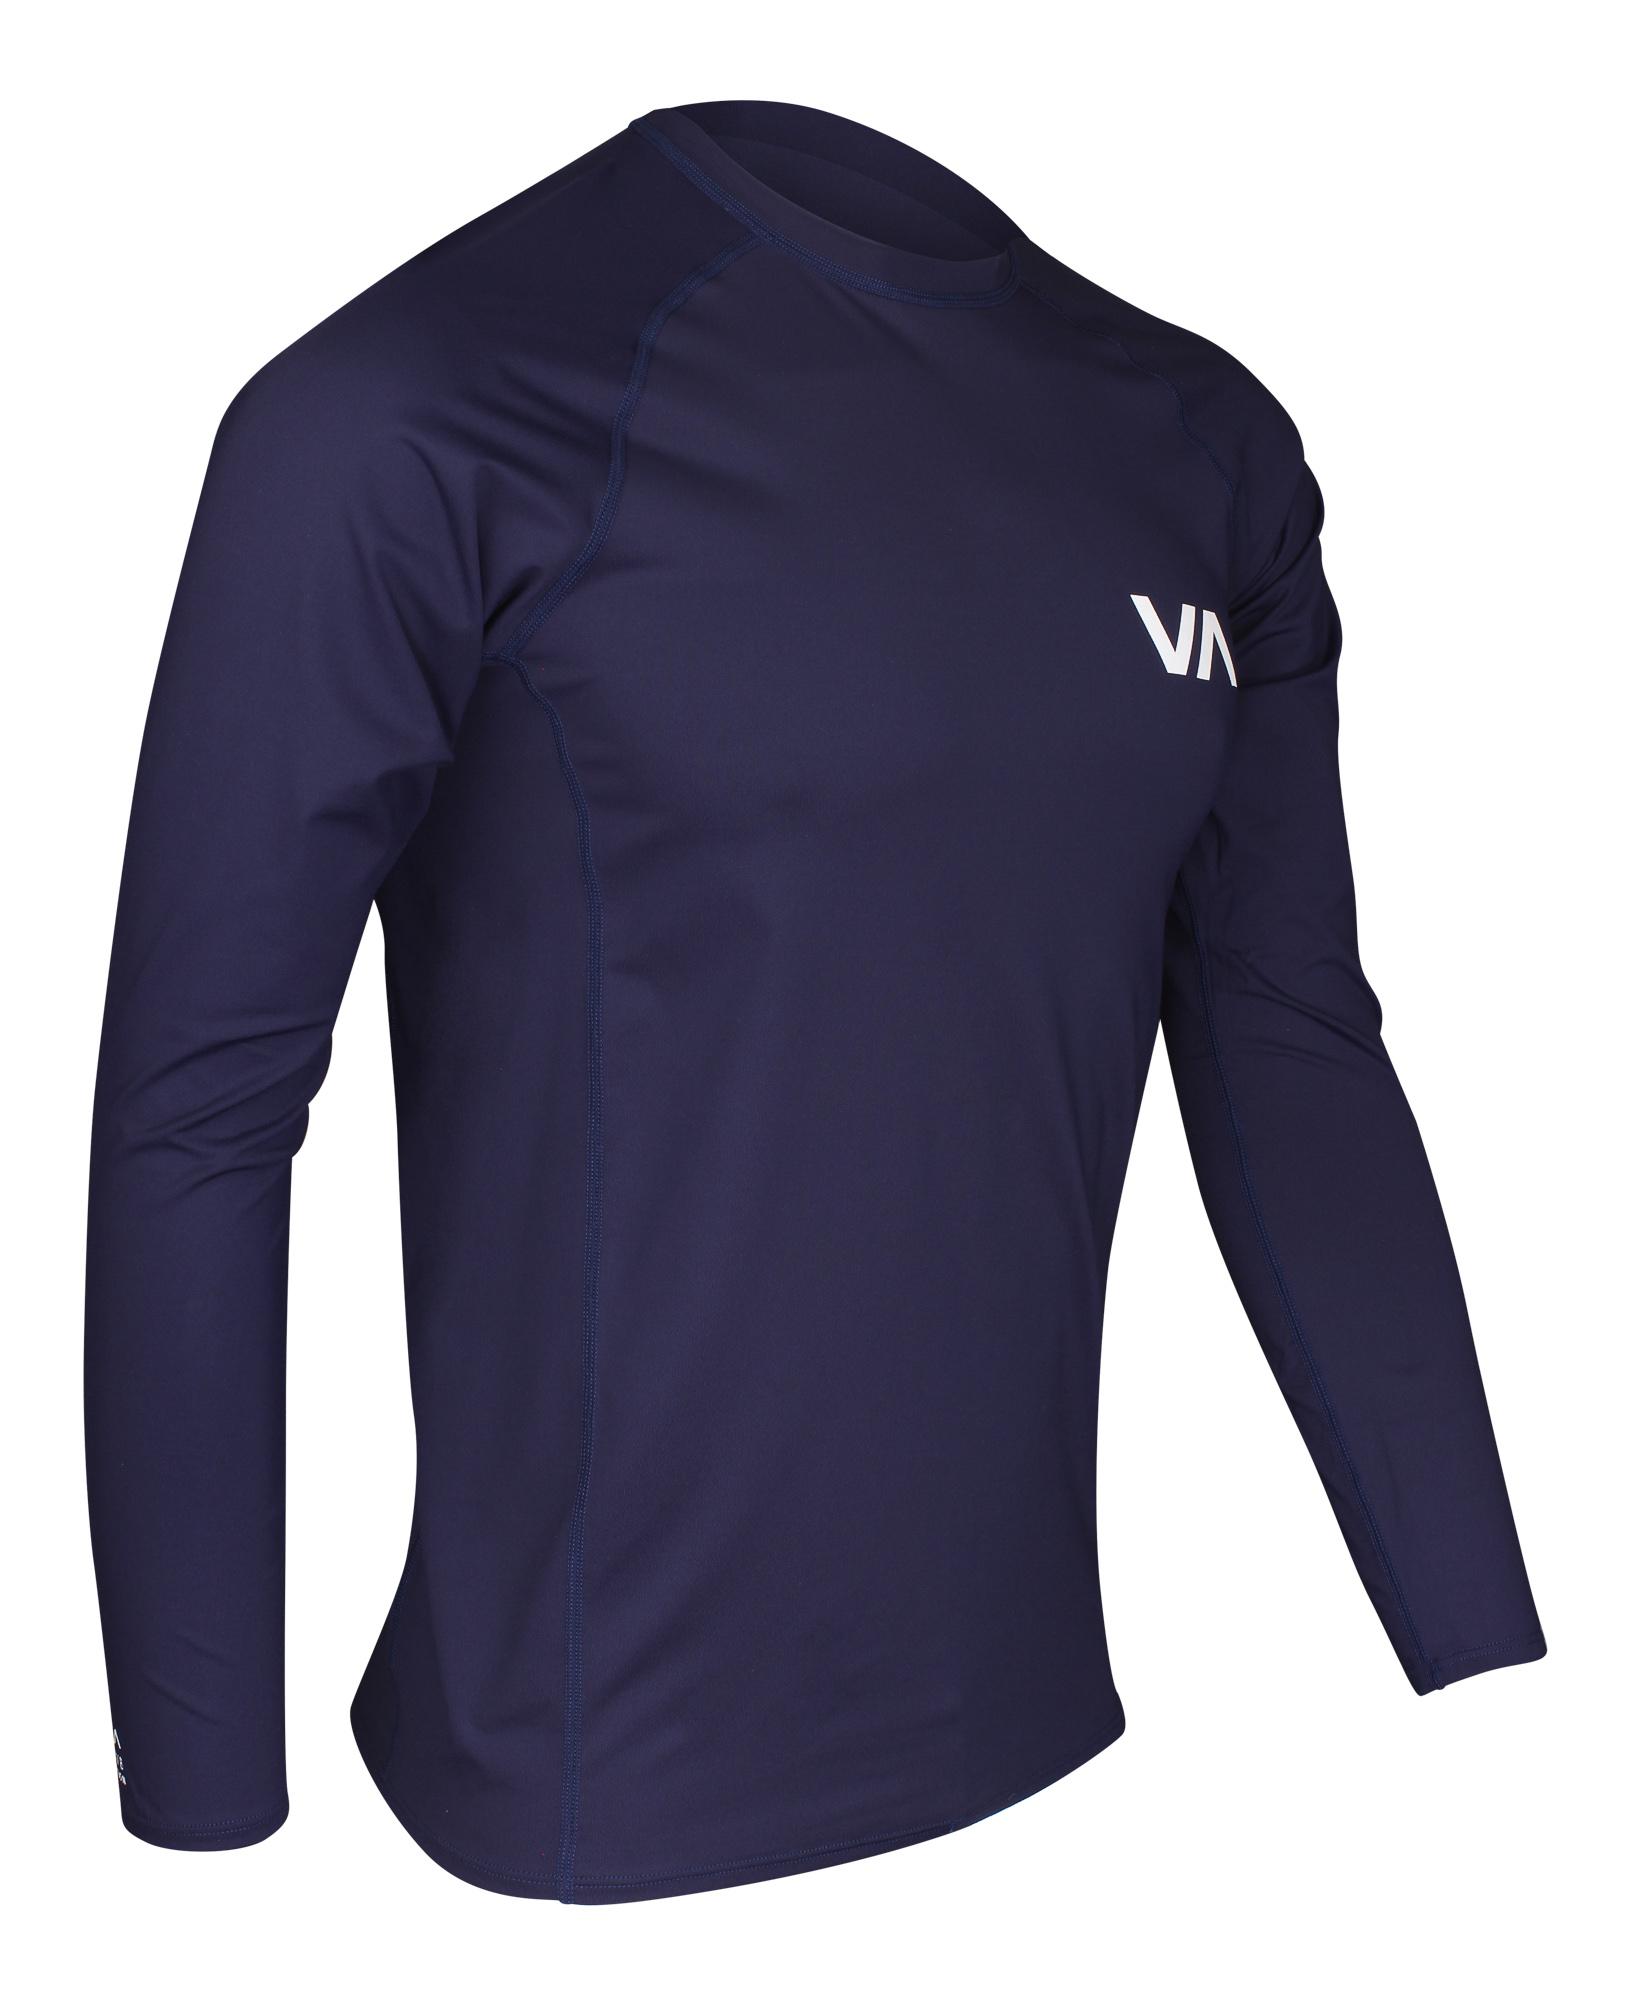 27ba429b64 Details about RVCA VA Sport Long Sleeve Rashguard (Navy)